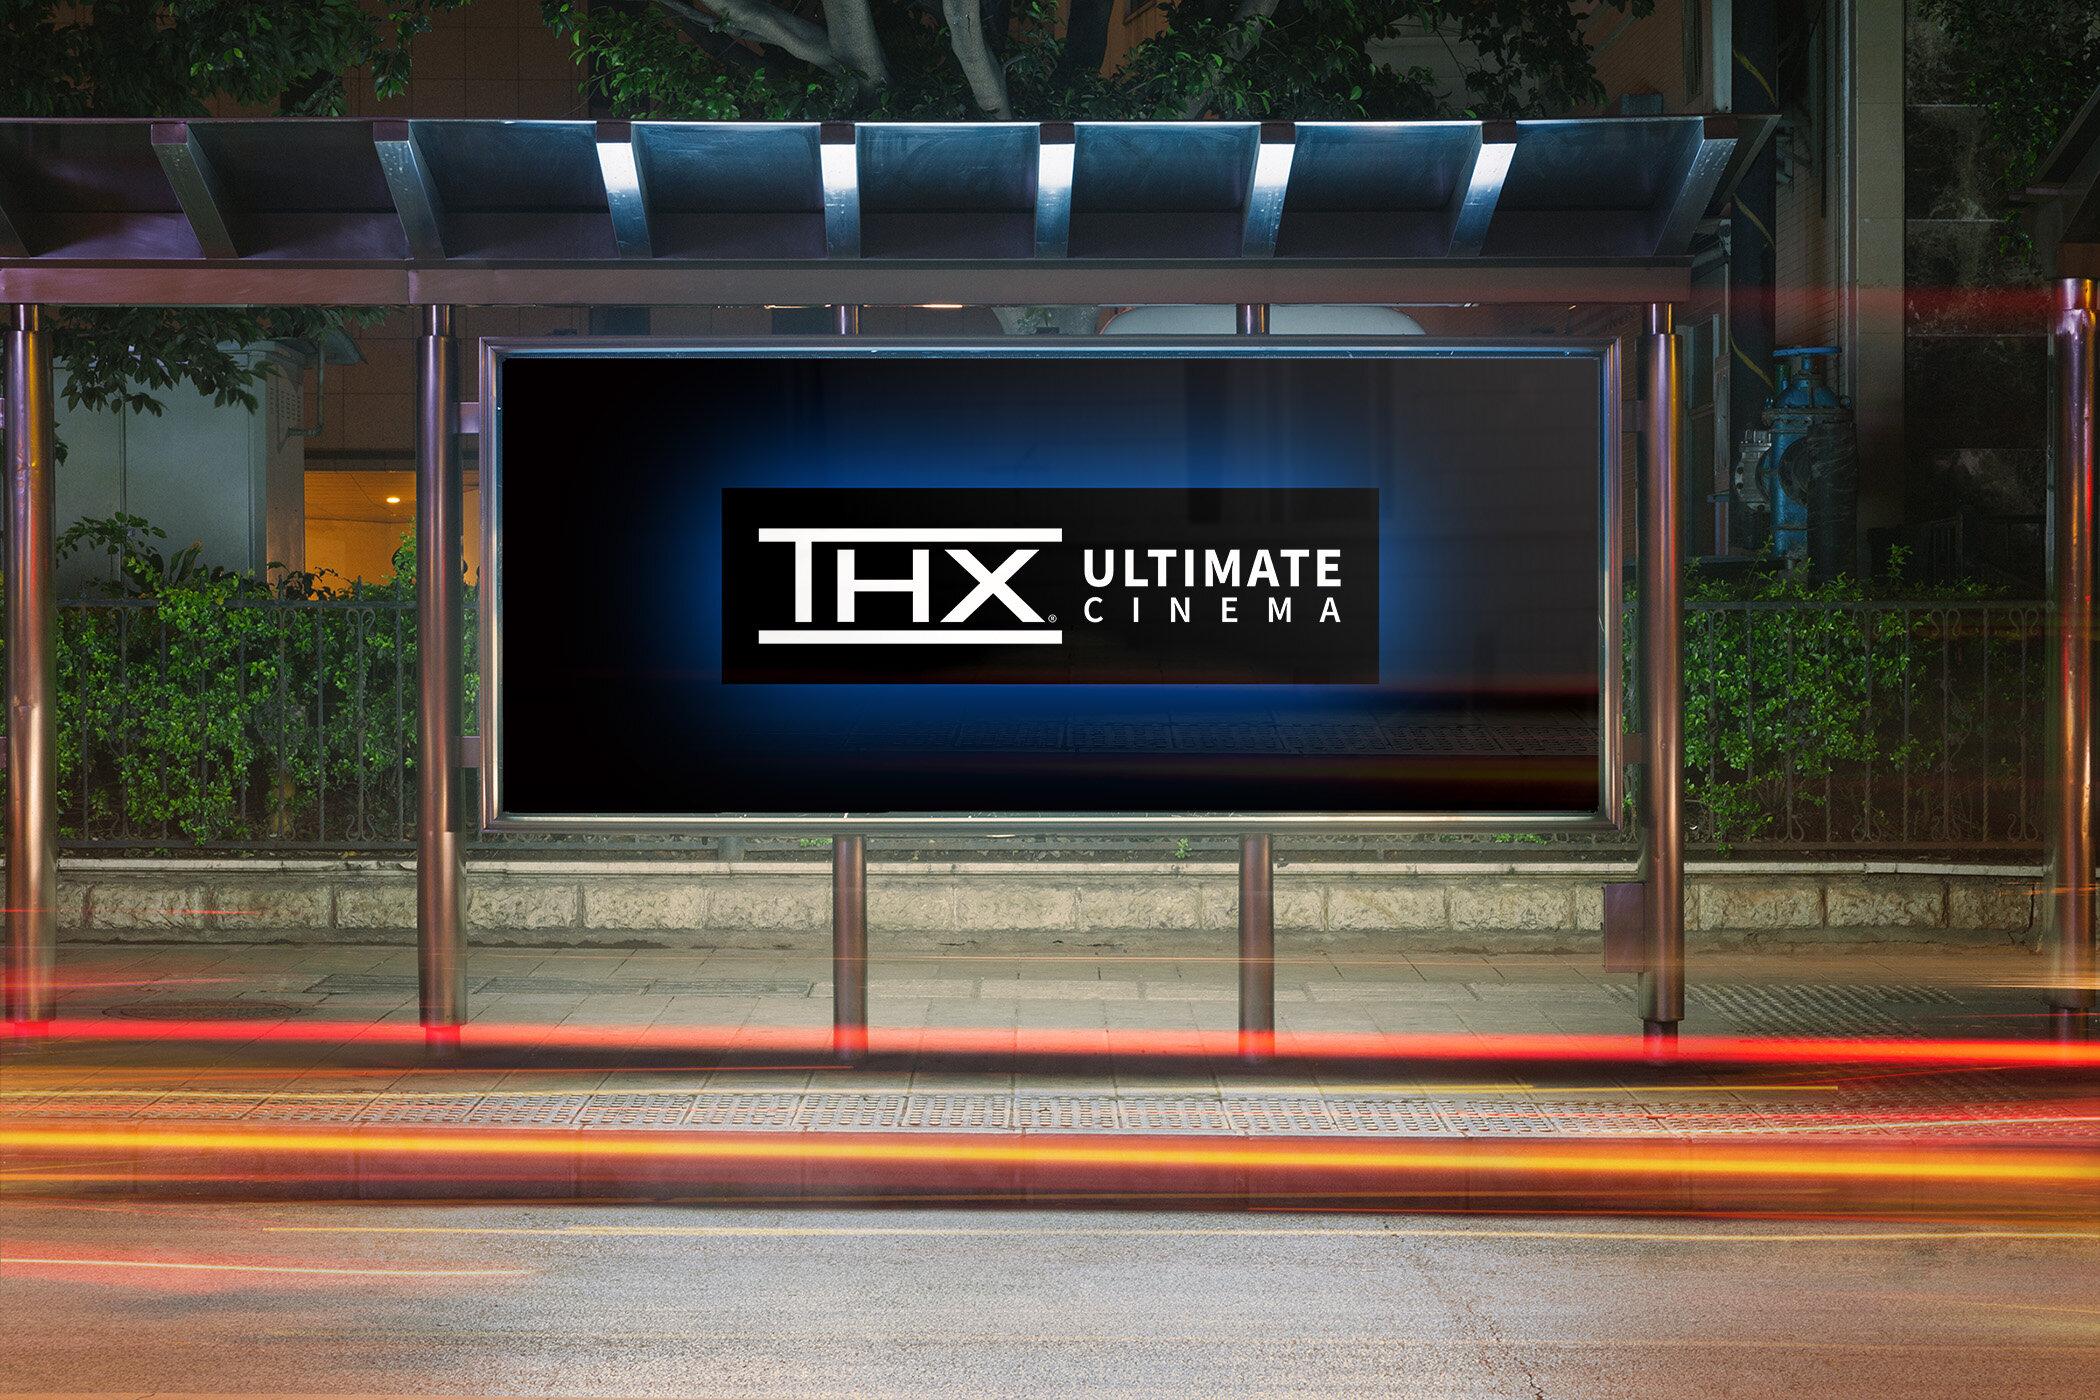 THX Ultimate Cinema Billboard Kai Version.jpg